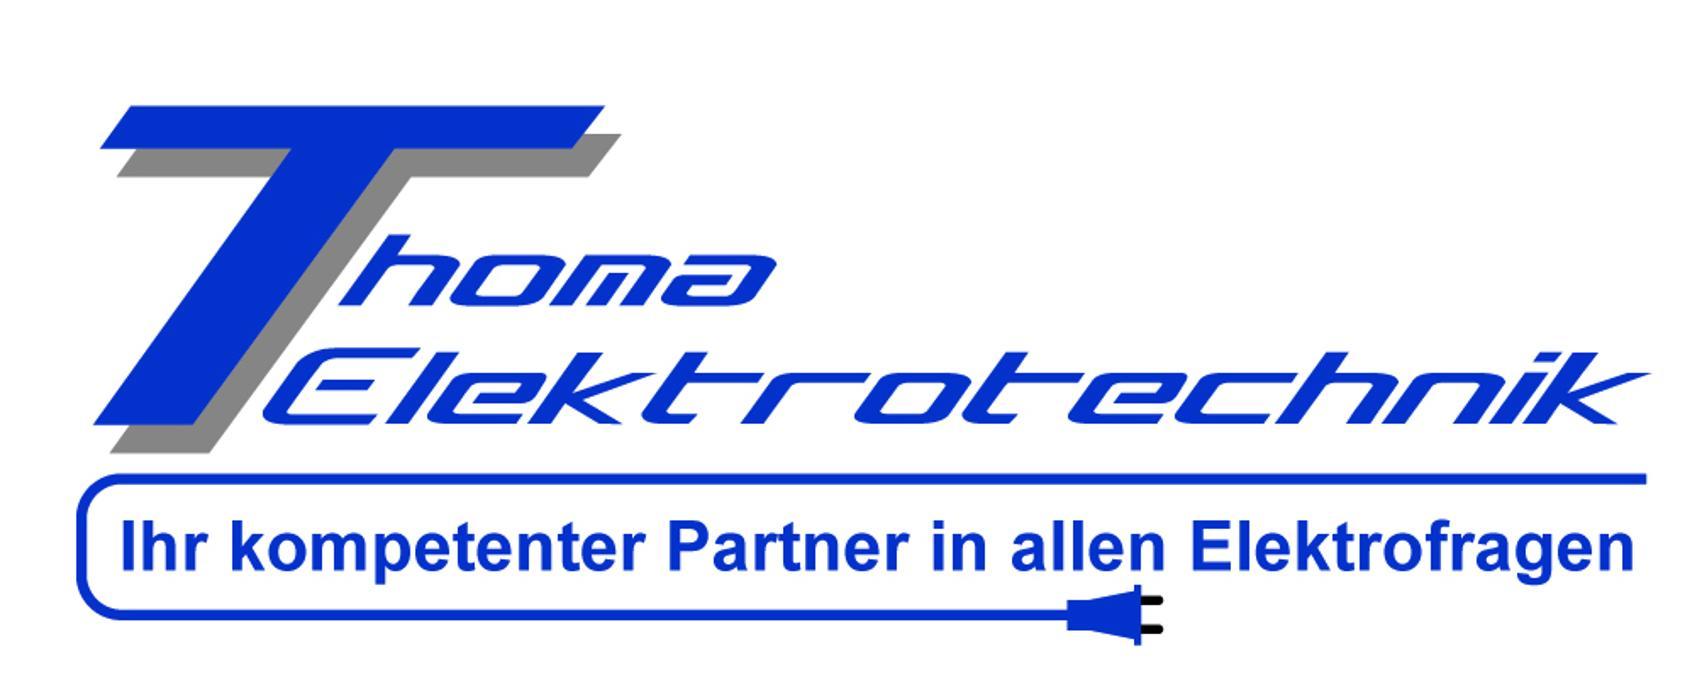 Bild zu Thoma-Elektrotechnik in Tuttlingen